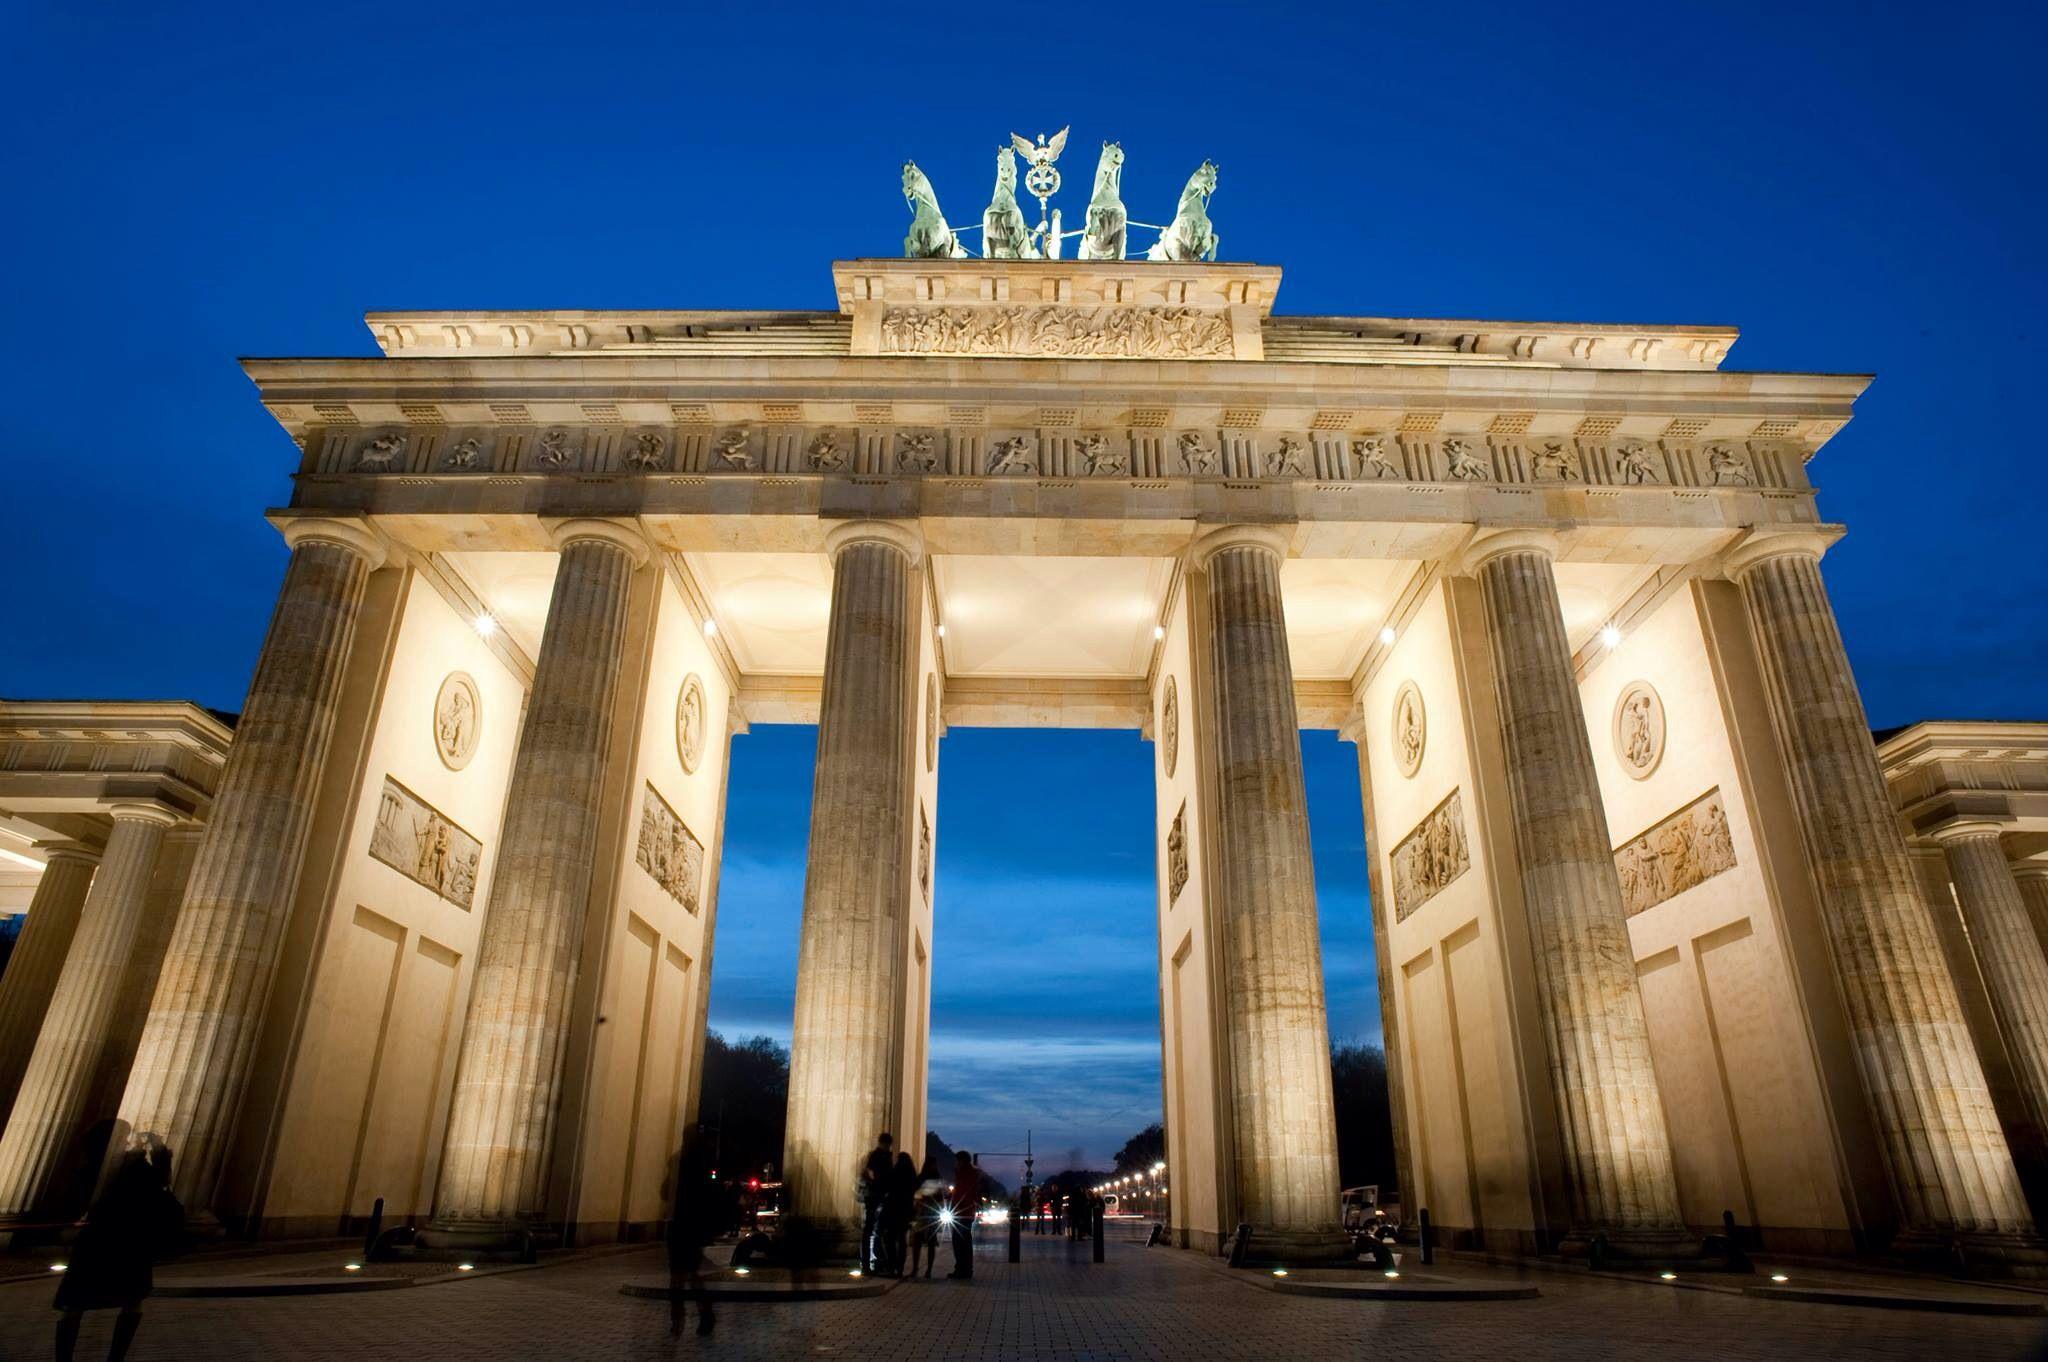 Brandenburger Tor With Images Brandenburg Gate Gate Pictures Brandenburg